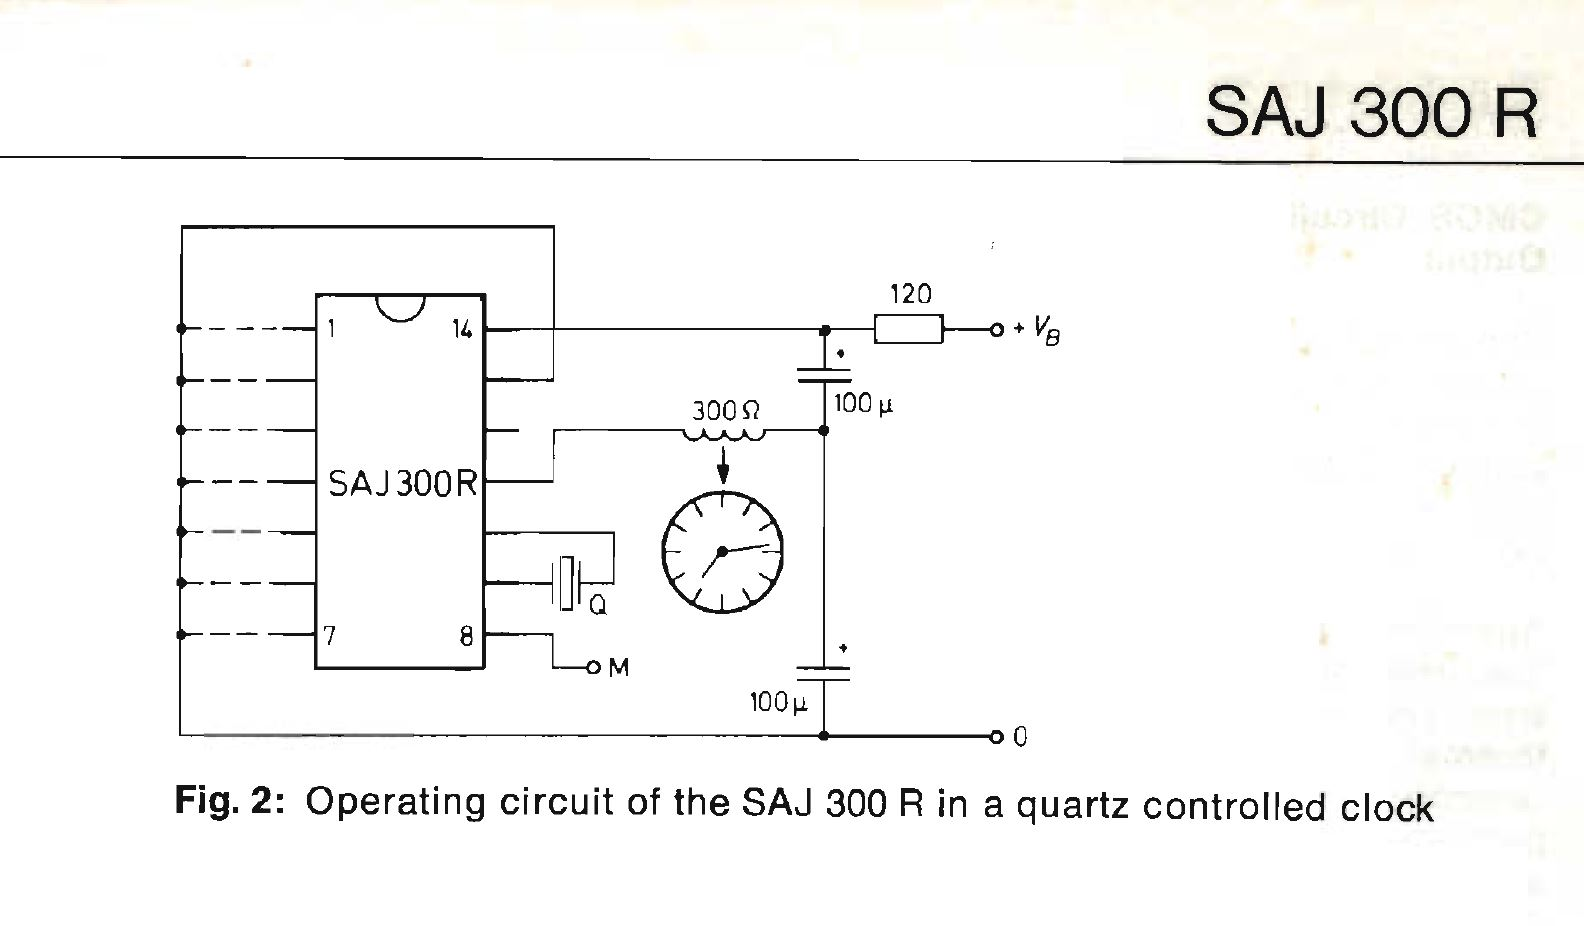 69 camaro clock wiring diagram porsche 911/928/944 vdo clock repair | 1965-1989 | pelican ... vdo clock wiring diagram